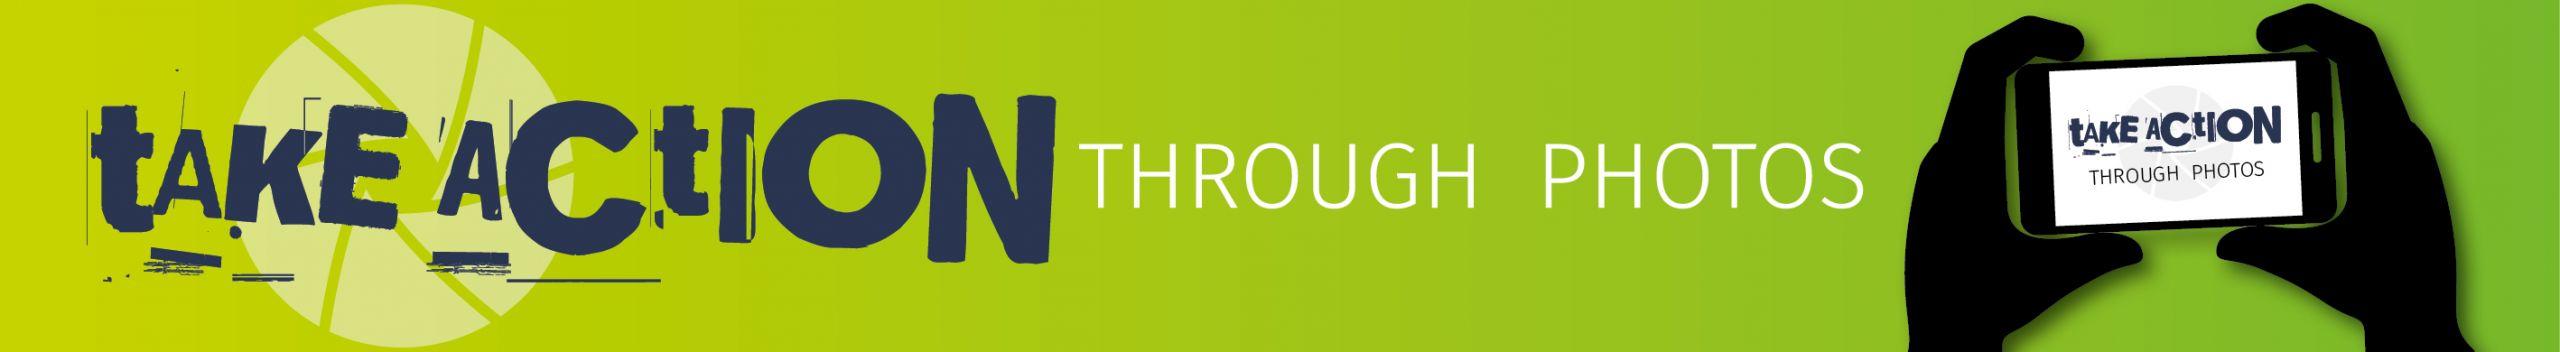 Take Action Trough Photos Programme Information